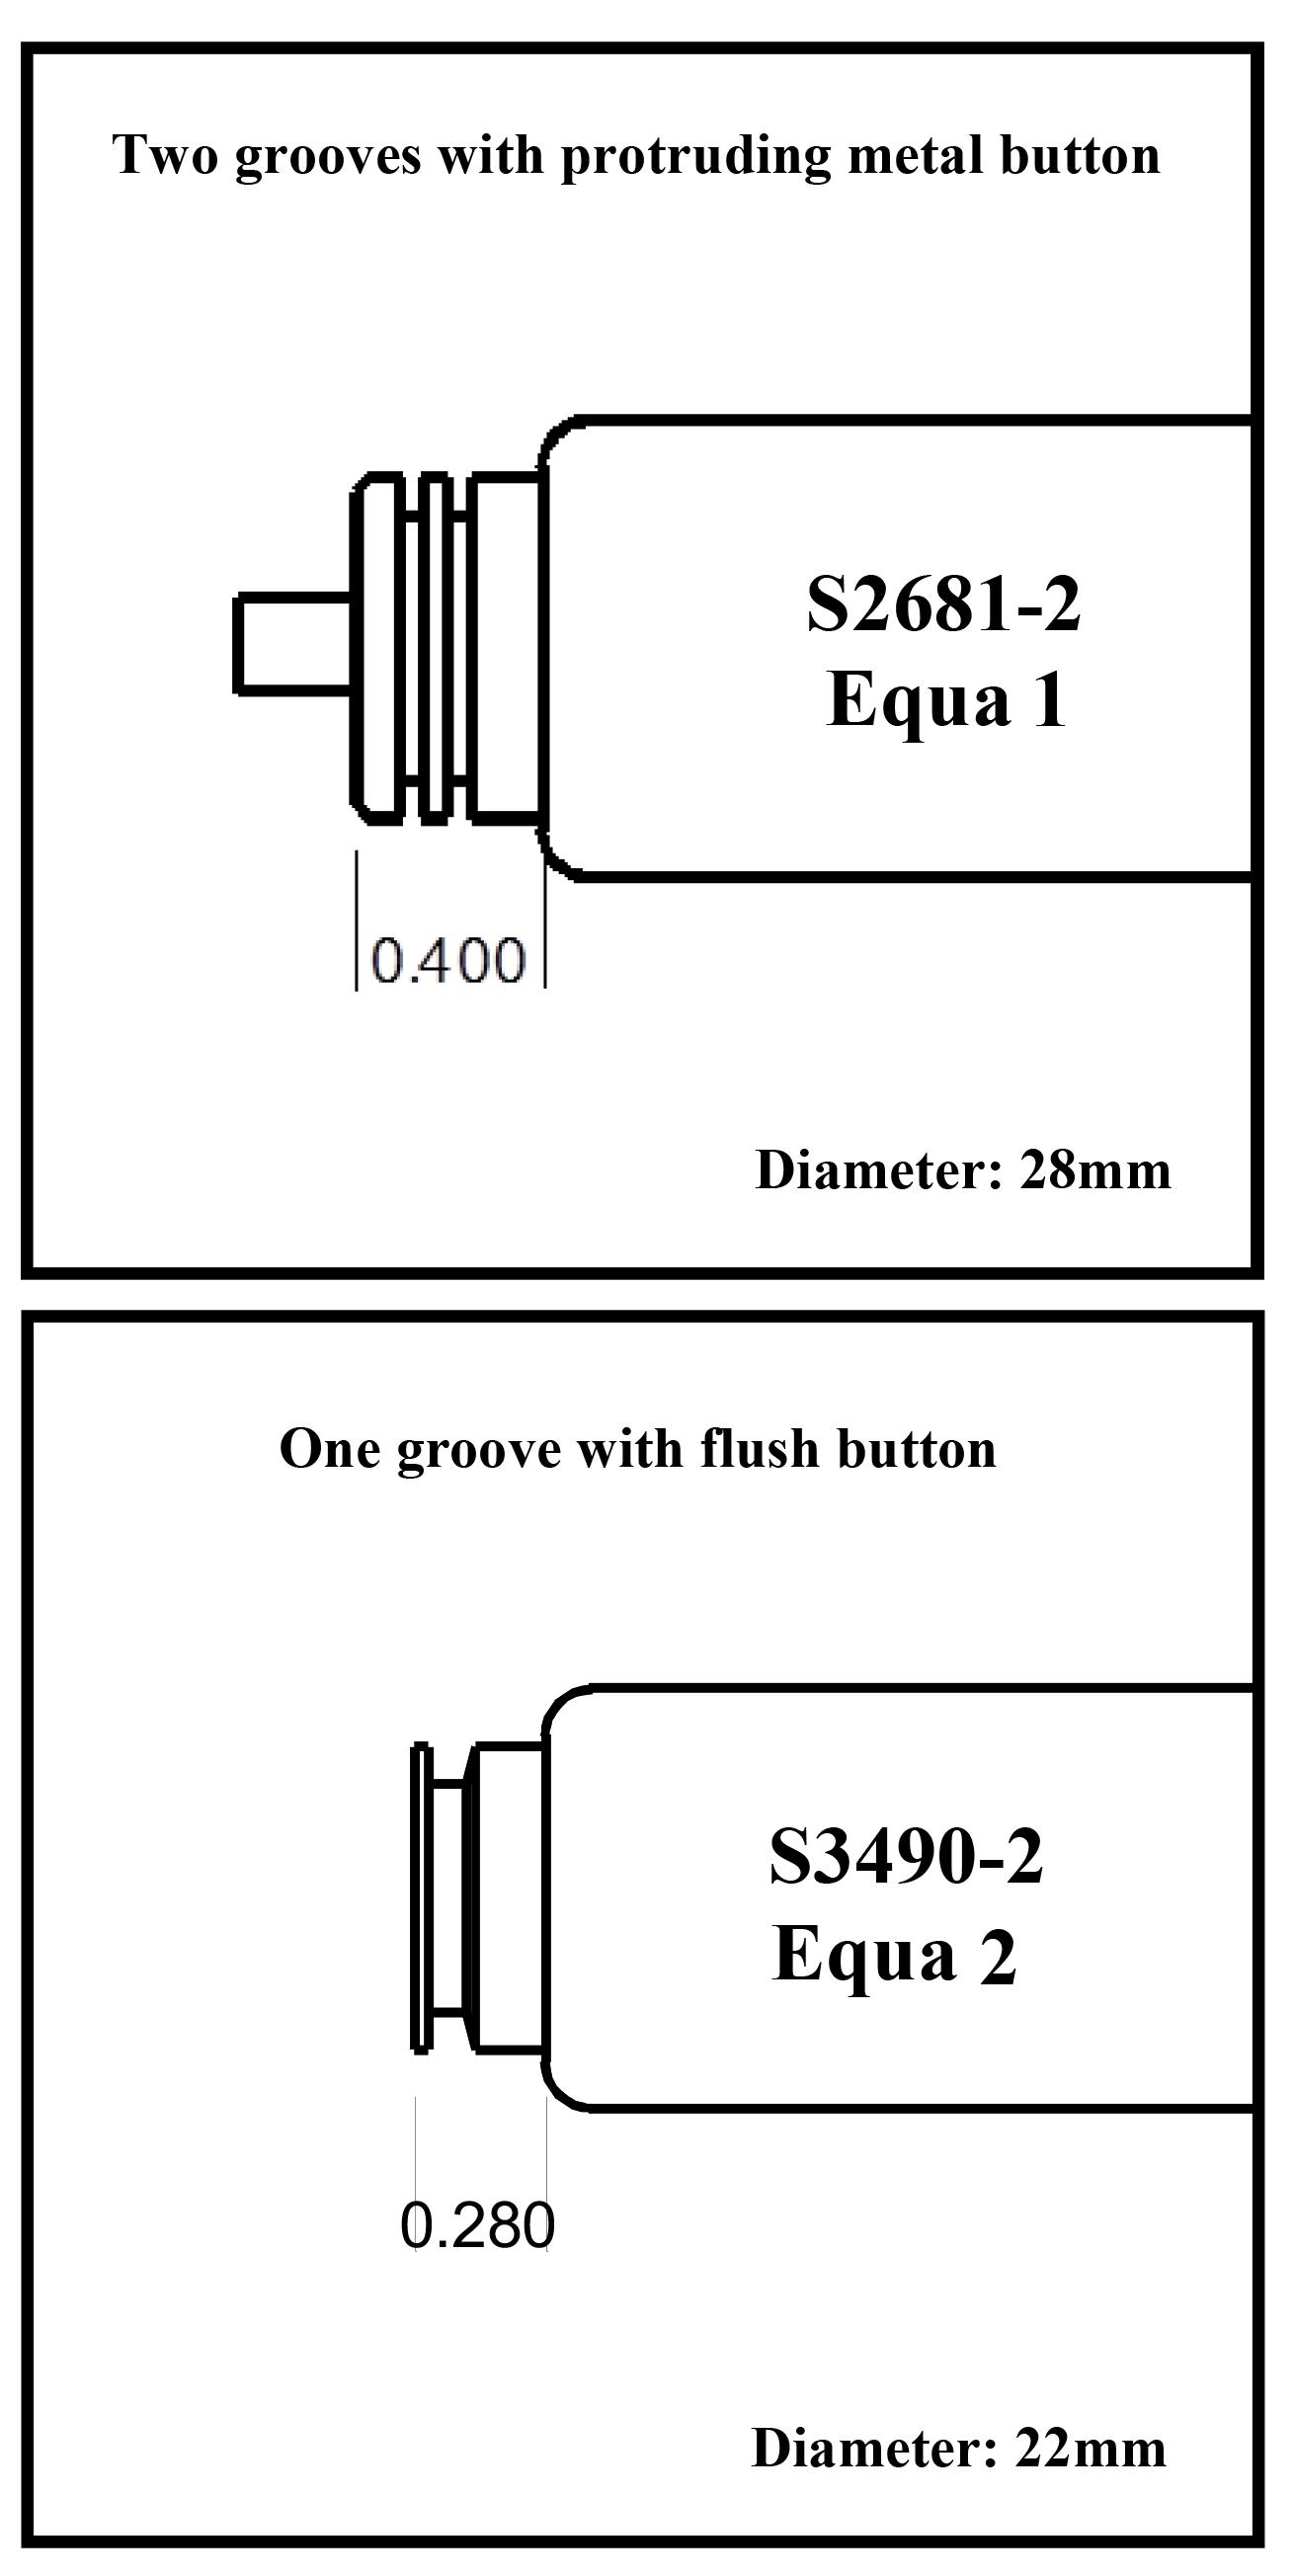 comparing-equa-1-and-equa-2.png